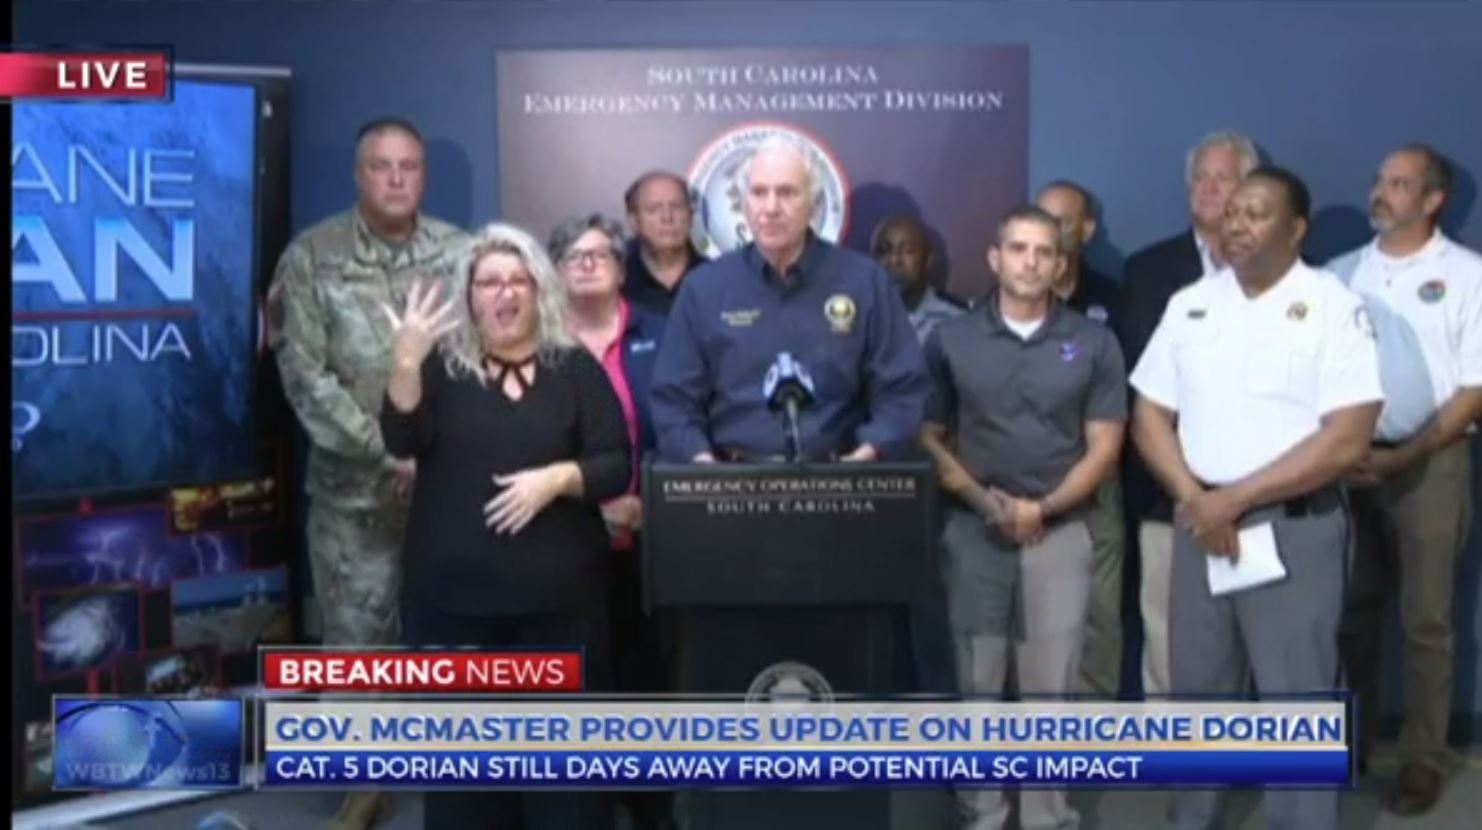 Governor McMaster outlines preparations for Hurricane Dorian